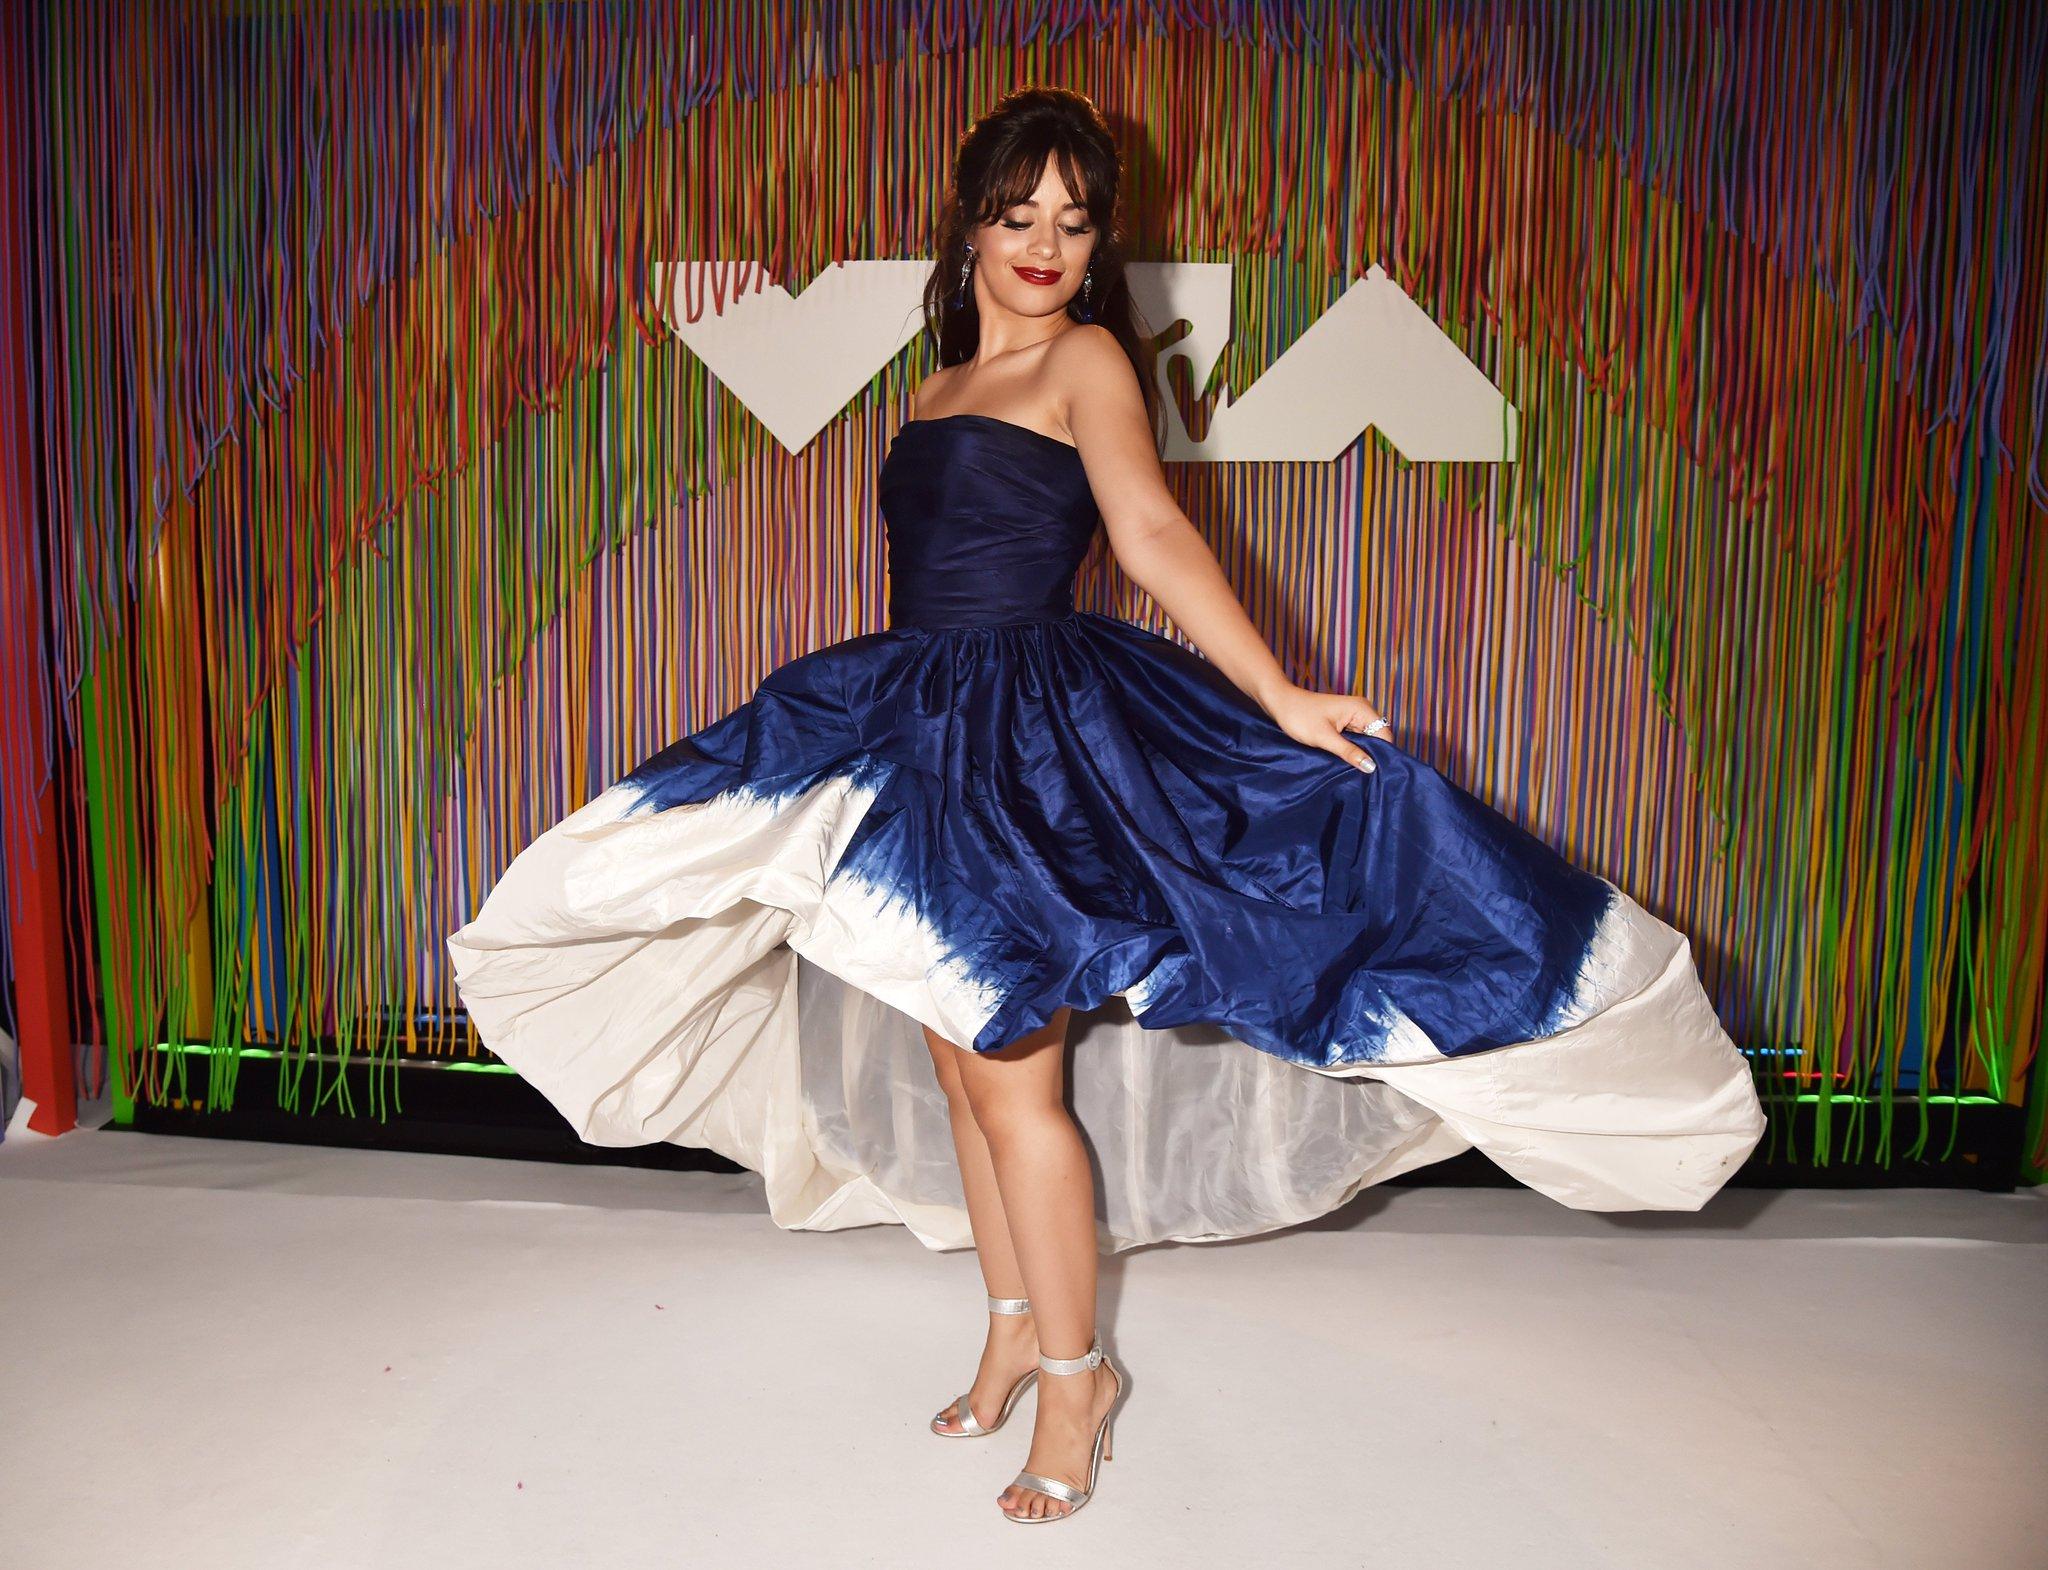 Permanent #mood = @Camila_Cabello at the #VMAs! Twirl it! https://t.co/OAdbGkIW4M https://t.co/1gm7jtCvq2